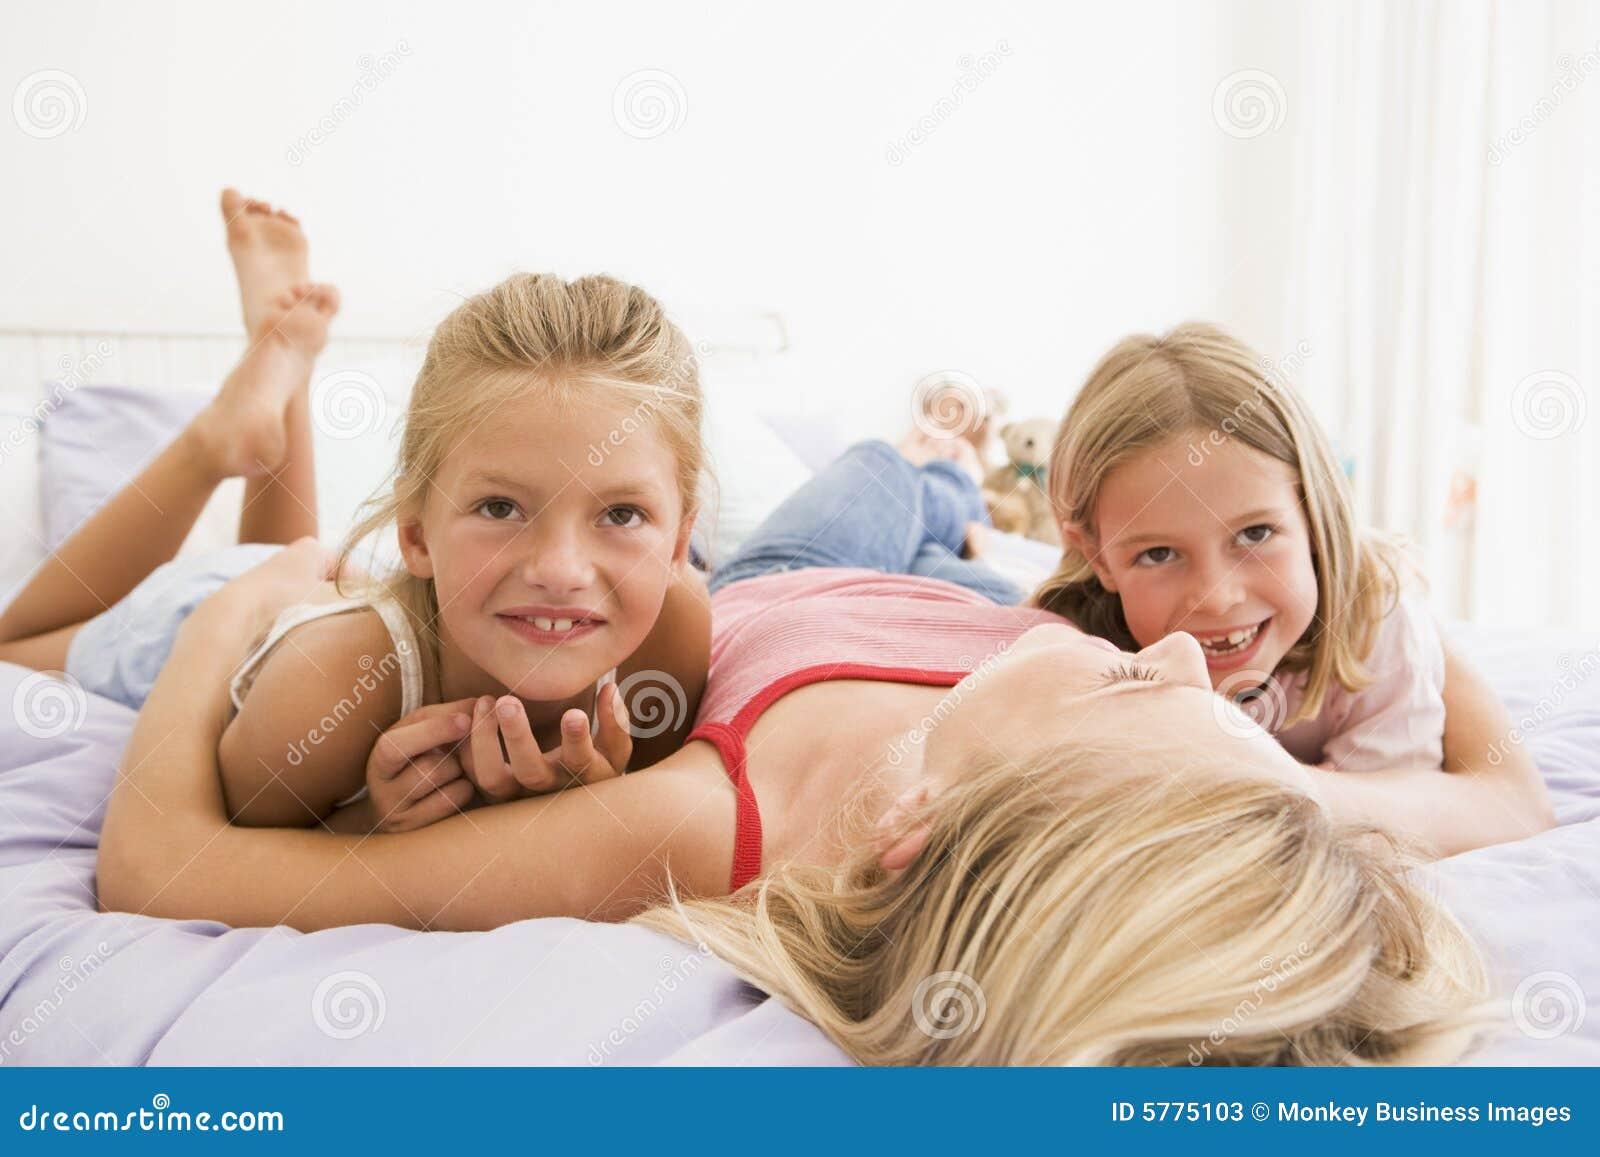 Free erotic girls pics